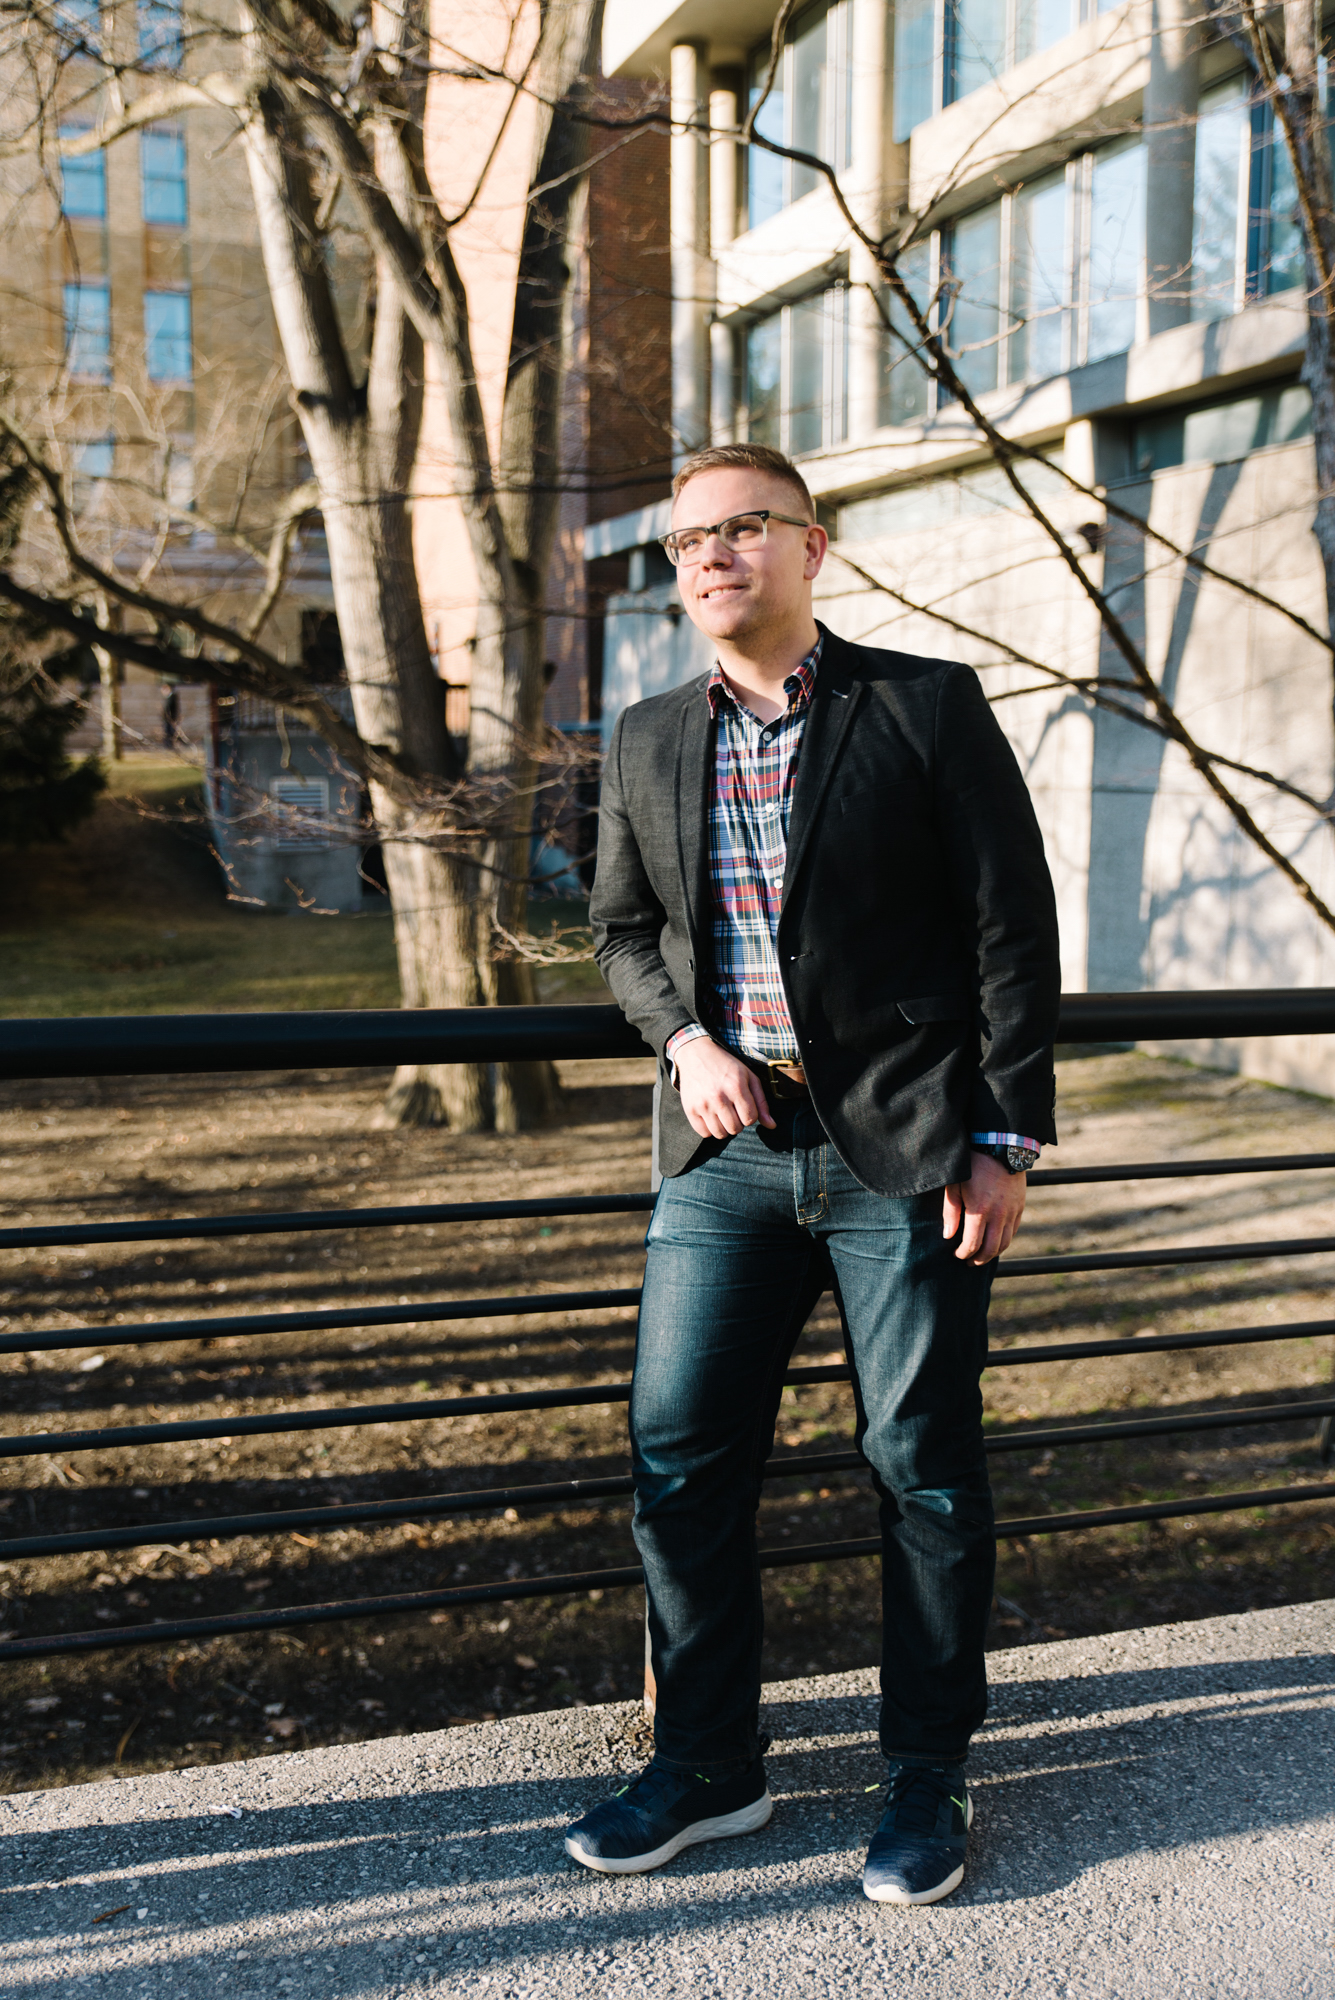 StefEthan-UofT-TRC-TruthandReconciliation-IndigenousIniatives-FacultyofMusic-EliotBirtton-TorontoPortraitPhotographer-7.JPG